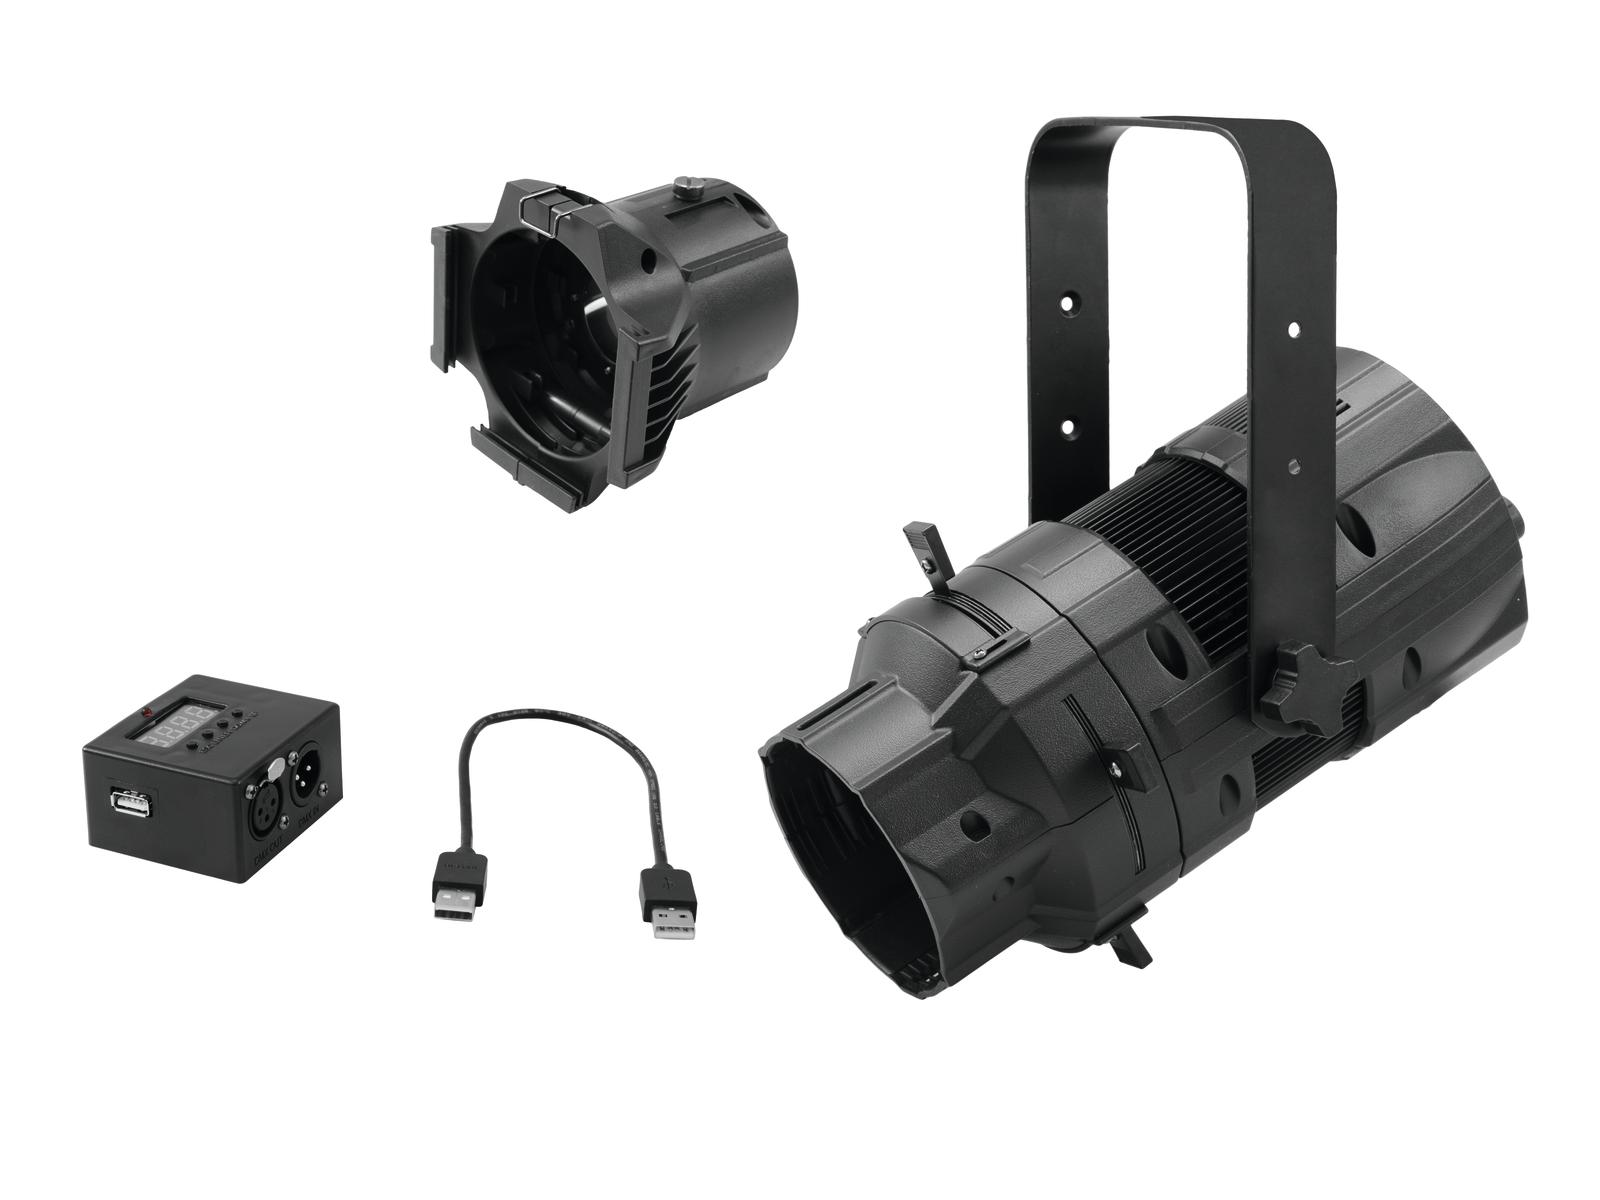 EUROLITE LED di Set PFE-50 + Lente di tubo 19° + Interfaccia DMX